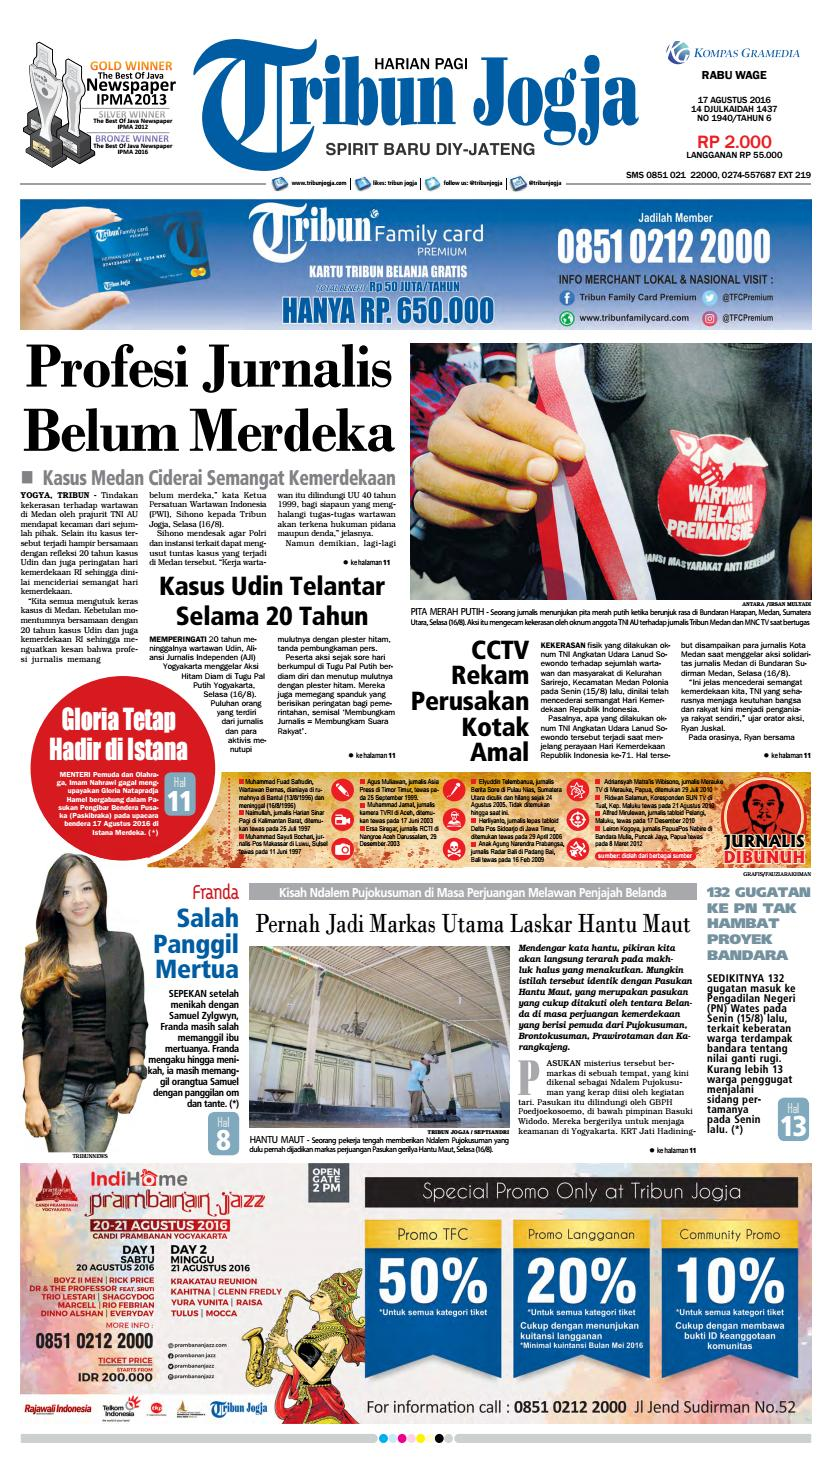 Tribunjogja 17 08 2016 By Tribun Jogja Issuu Produk Umkm Bumn Kapal Batok Lebak